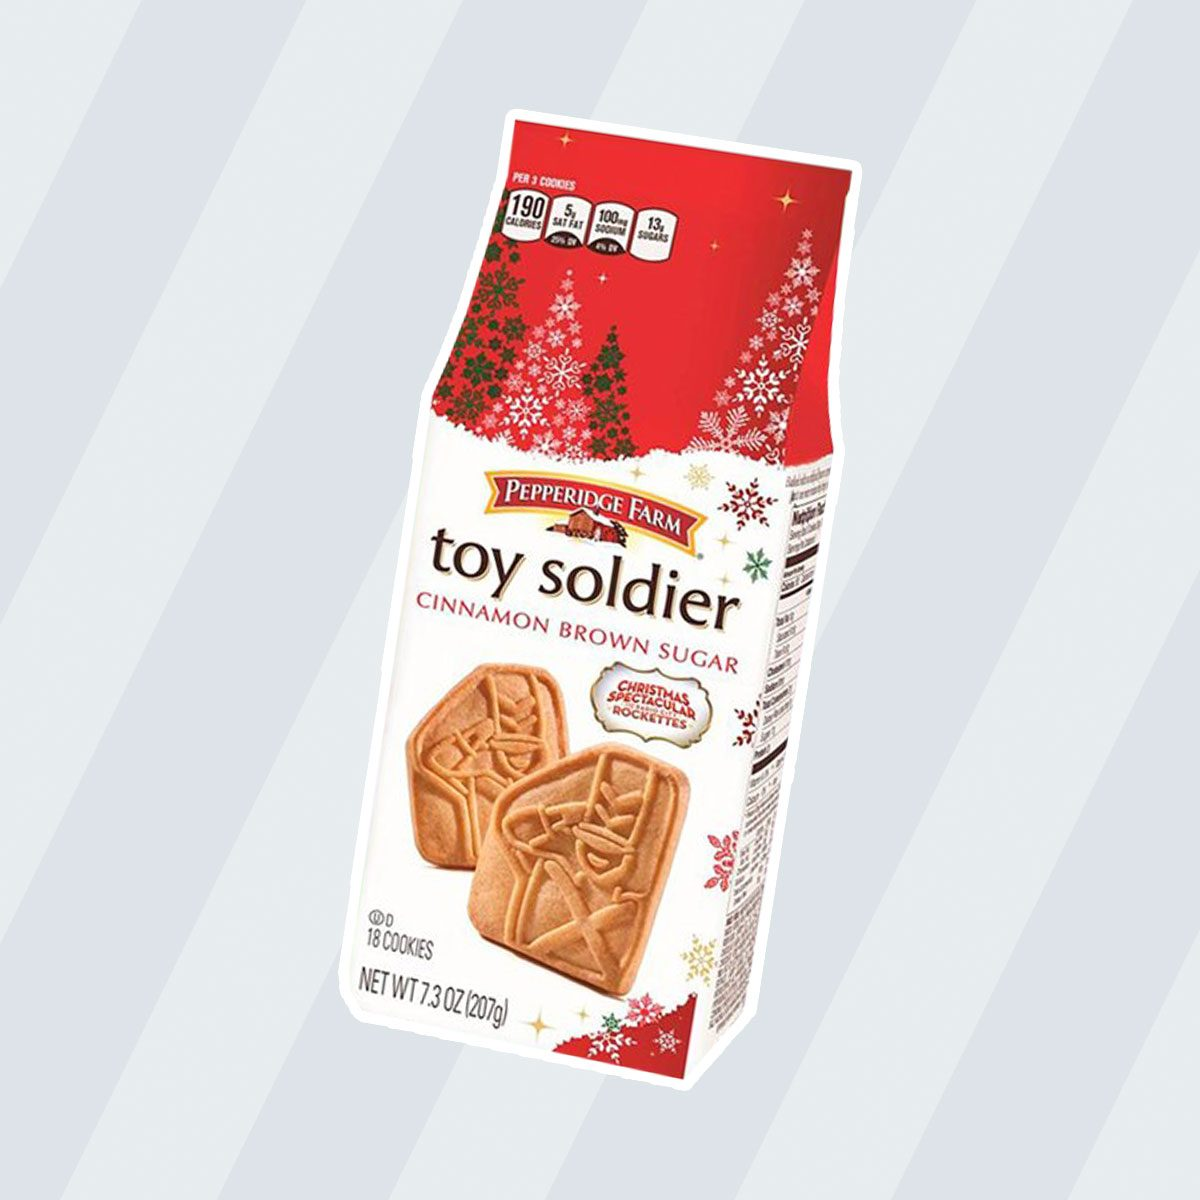 Pepperidge Farm Toy Soldier Cookies